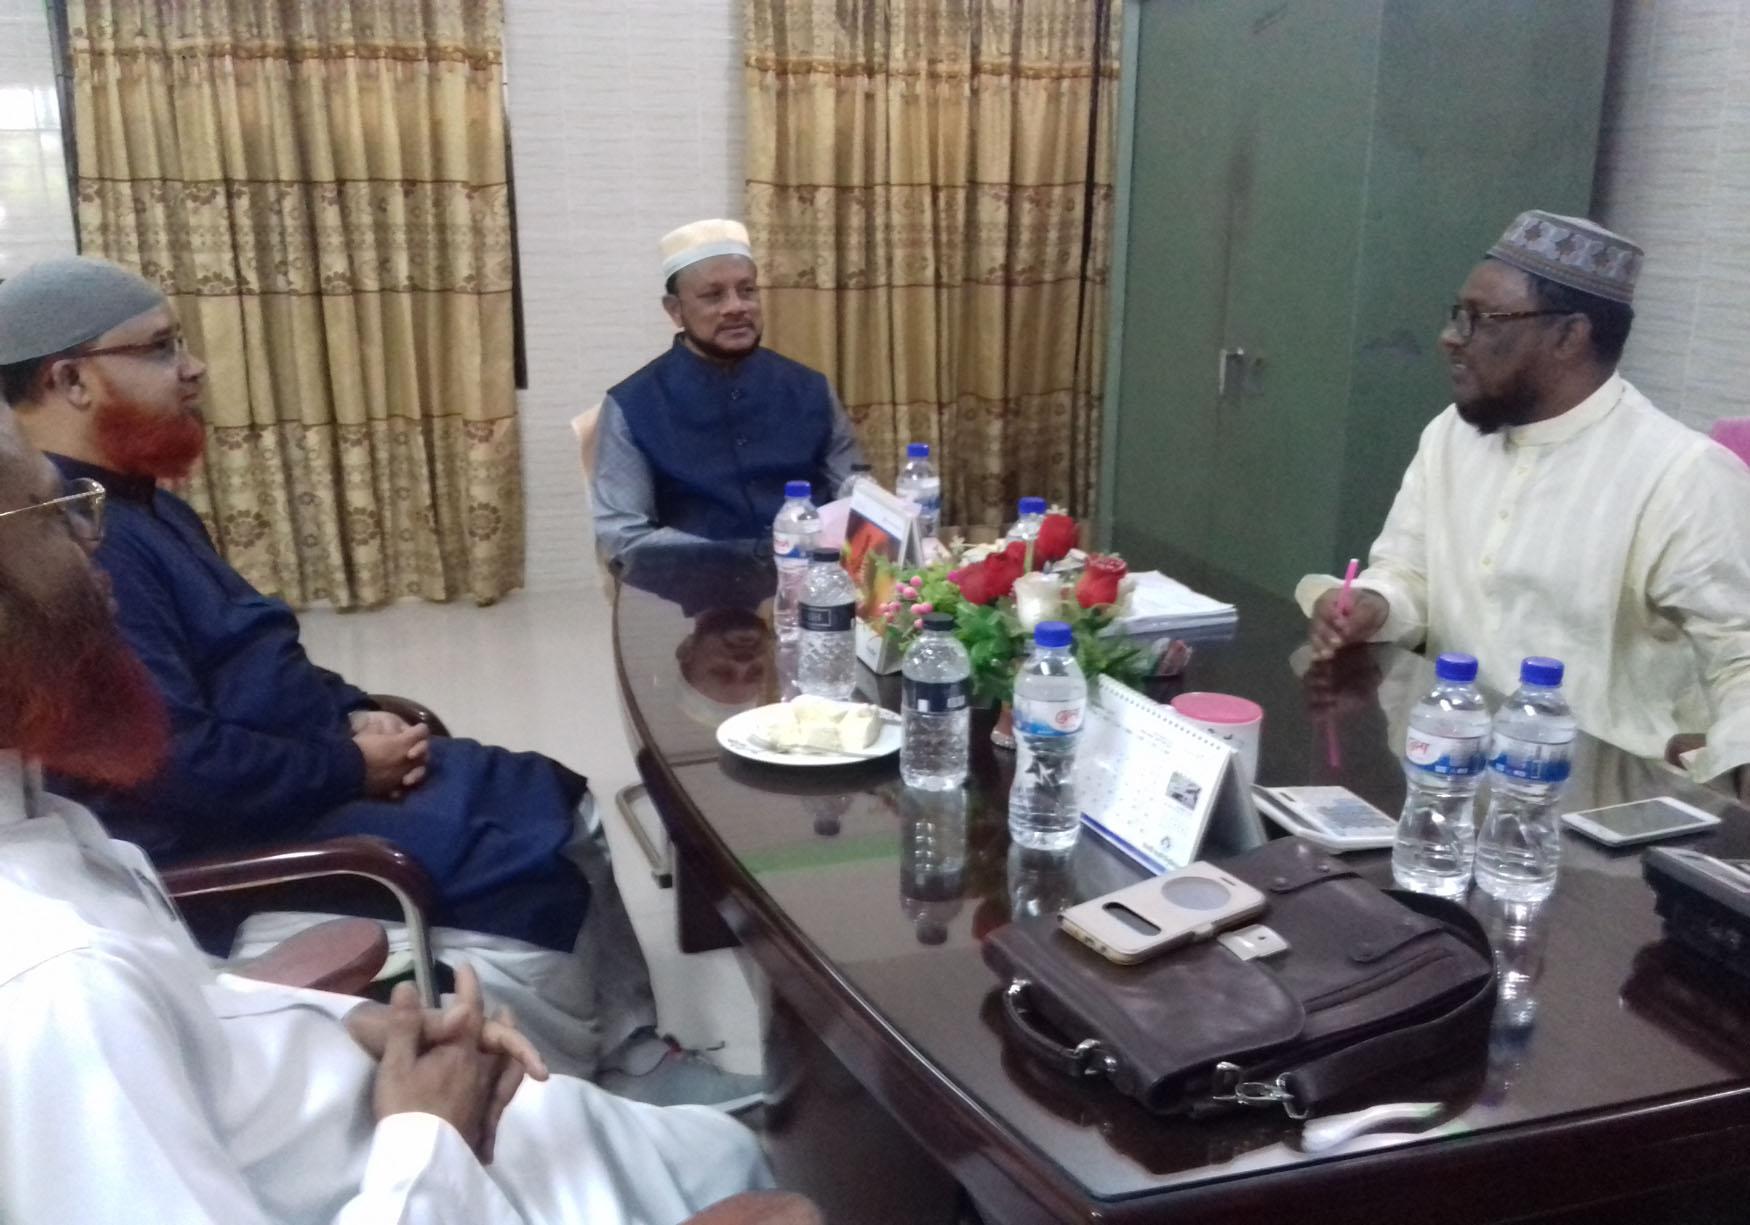 VC Islamic University visited Madrasah